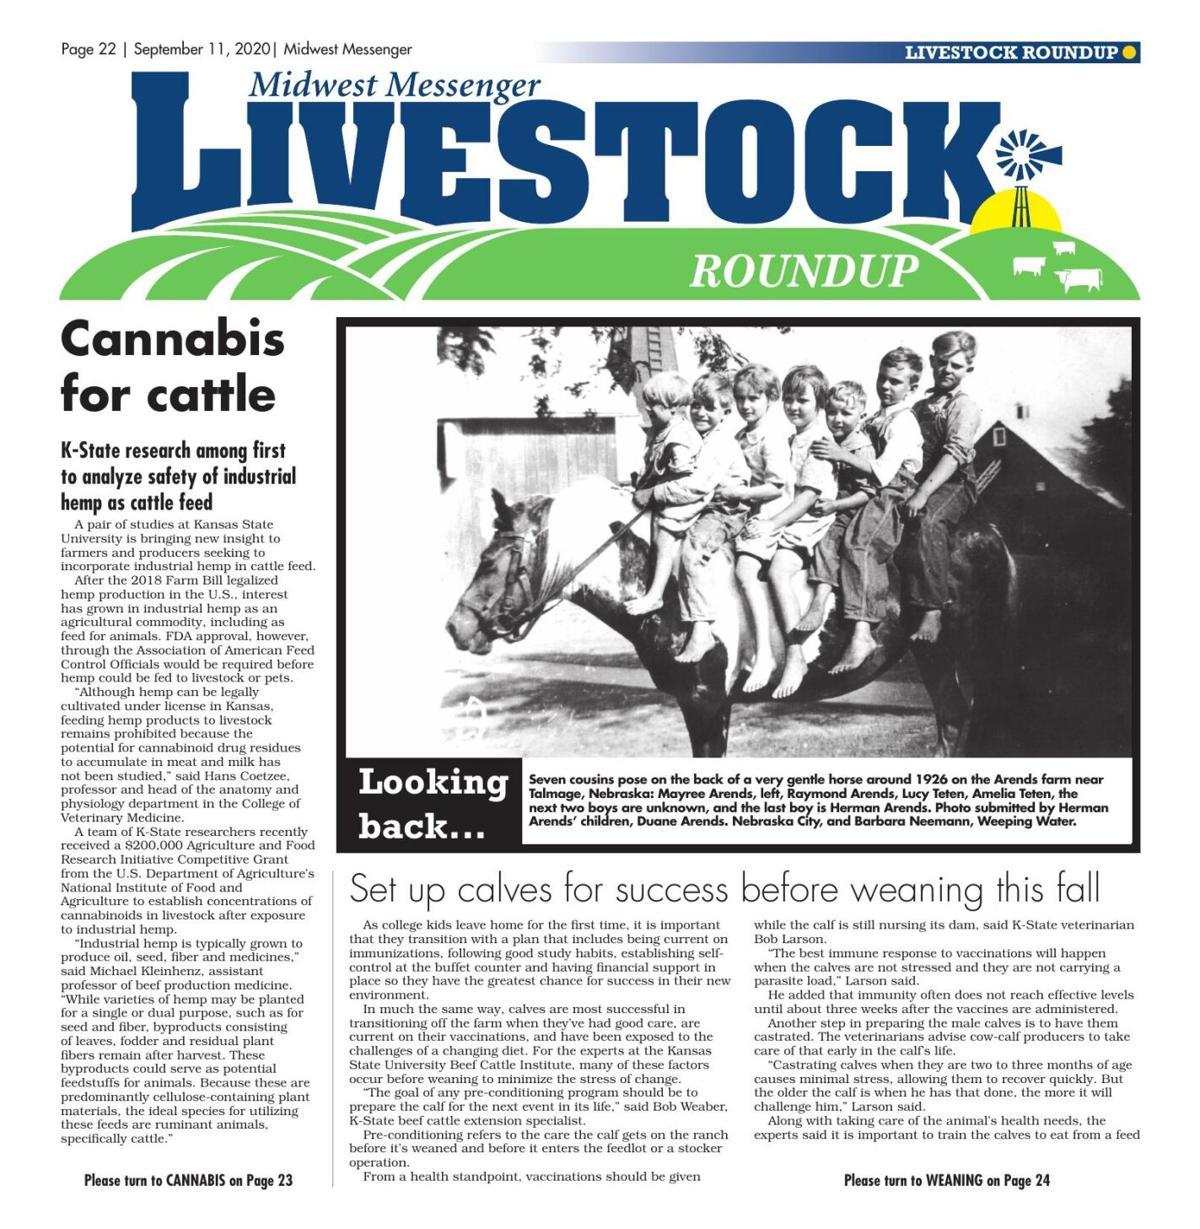 Livestock Roundup 9-11-20